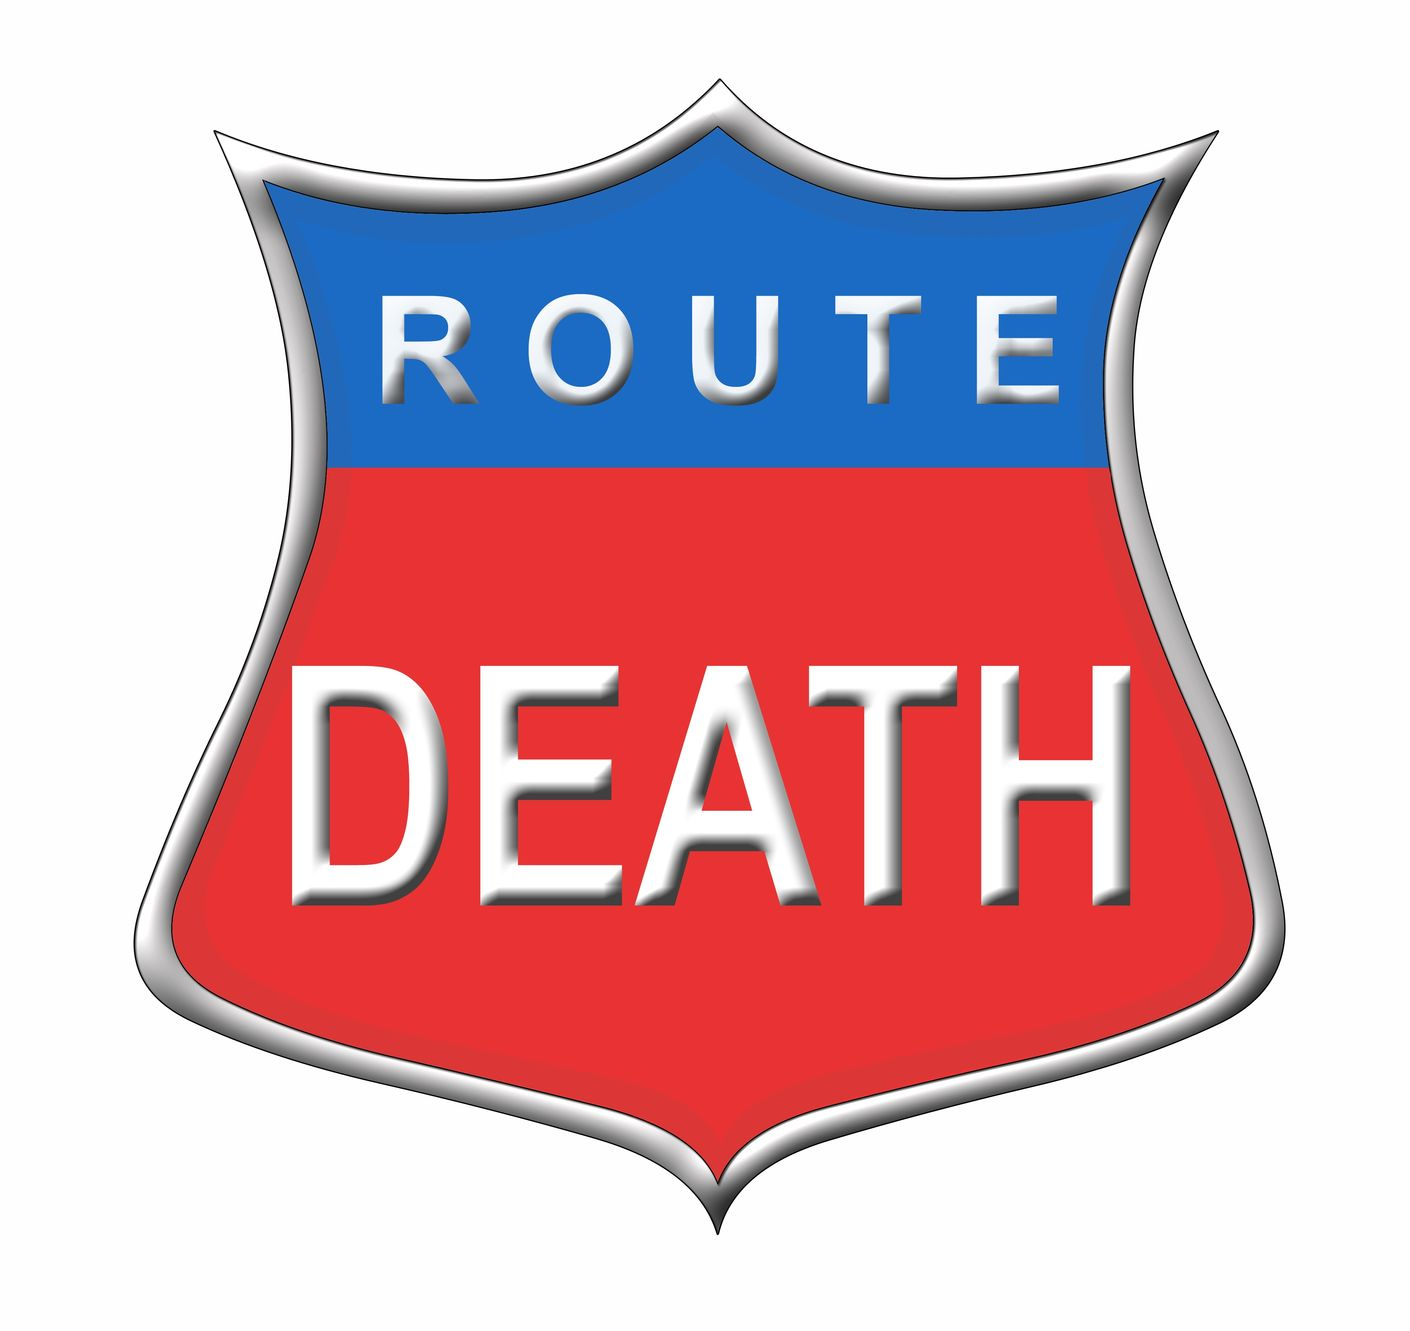 RouteDeath(1)